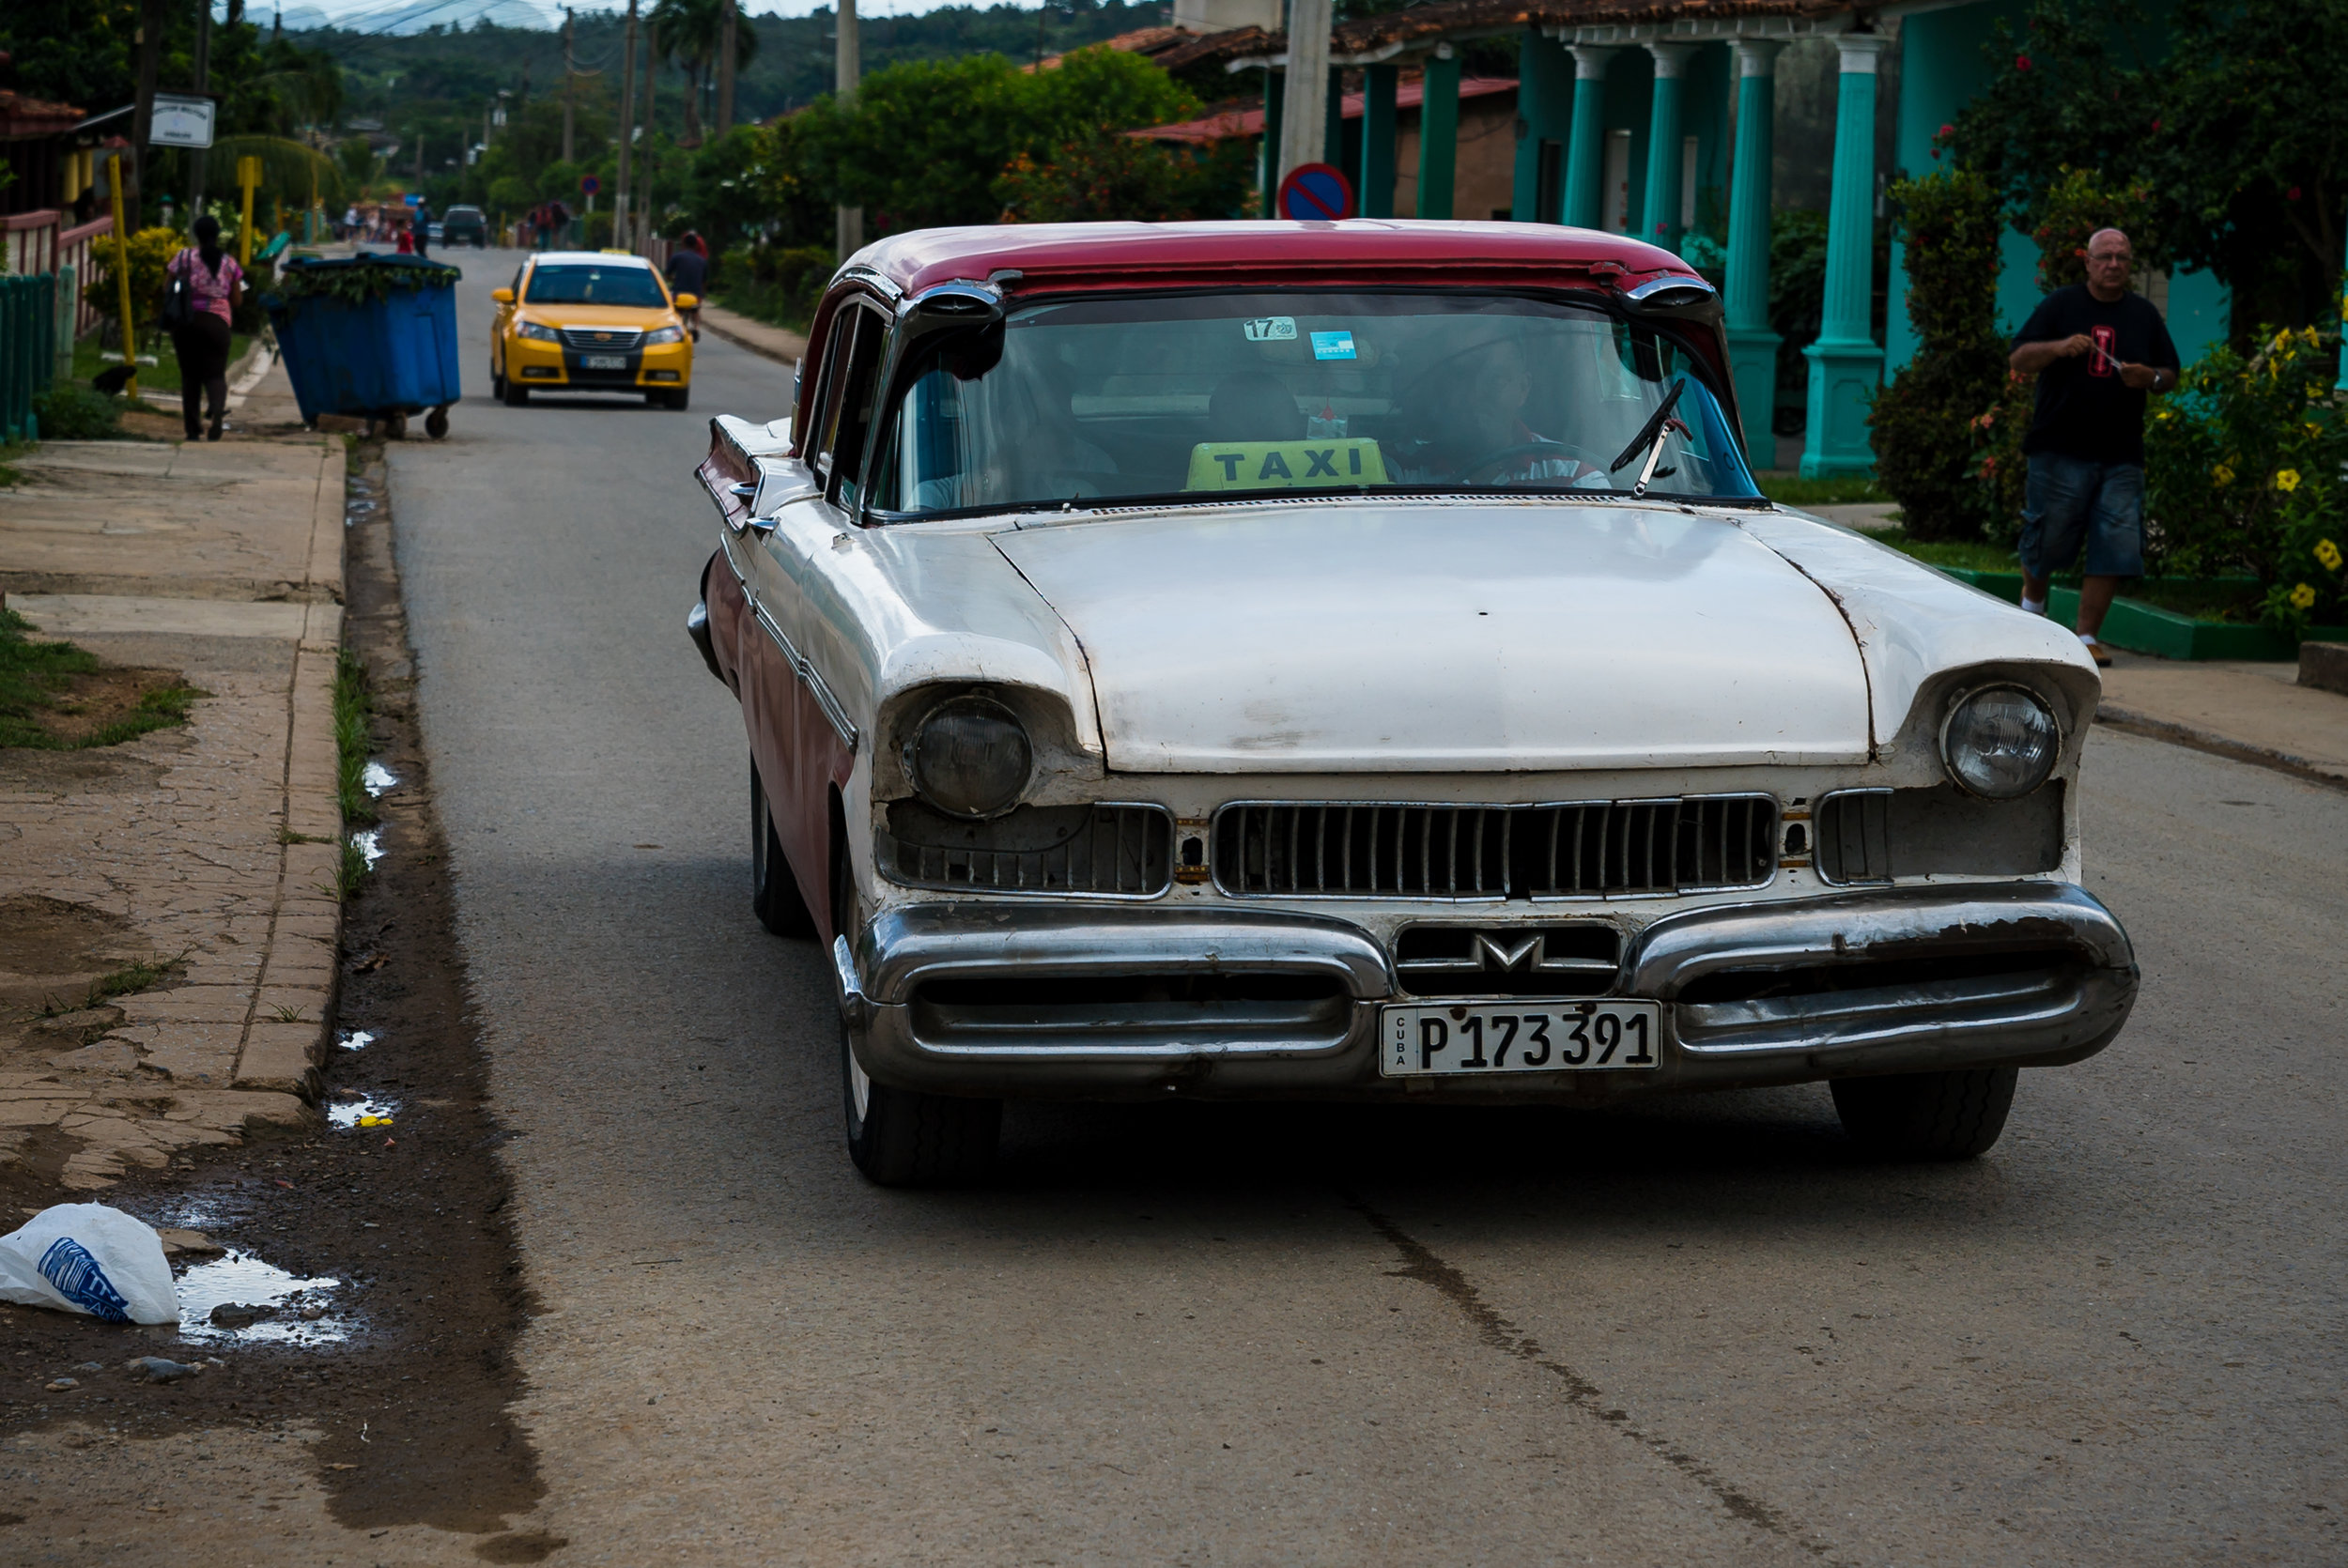 taxi3 (1 of 1).jpg